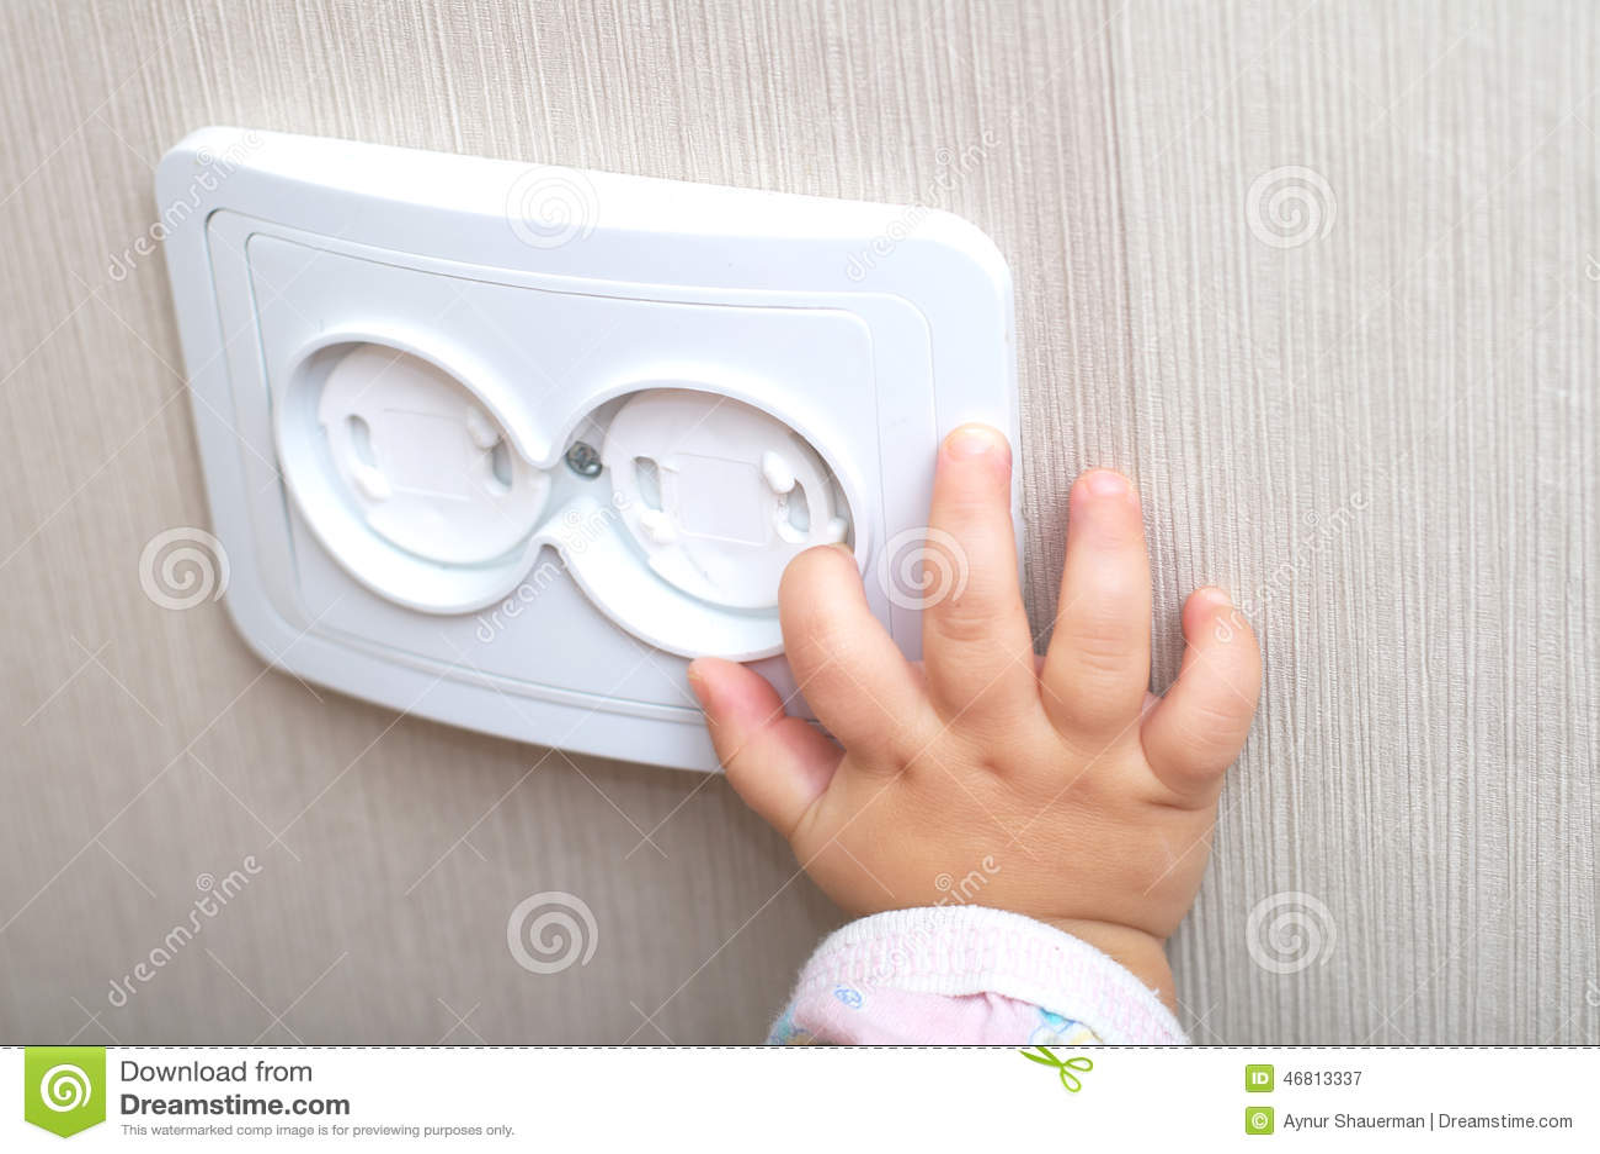 Elektrisk pålitlighet av ac-maktuttag i hem